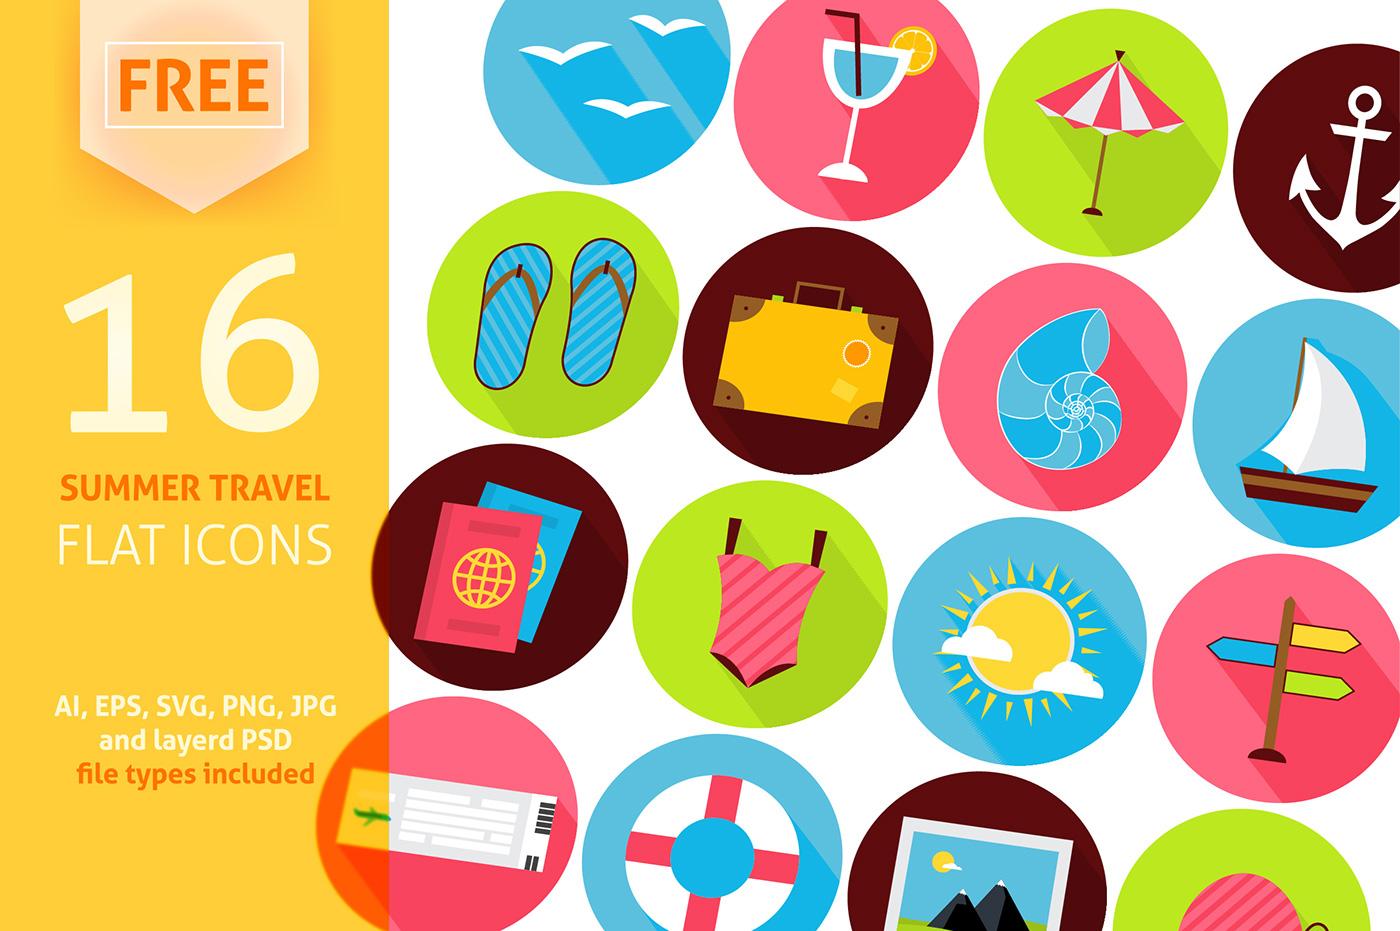 16 Free Summer Travel Icons PSD | Psdblast